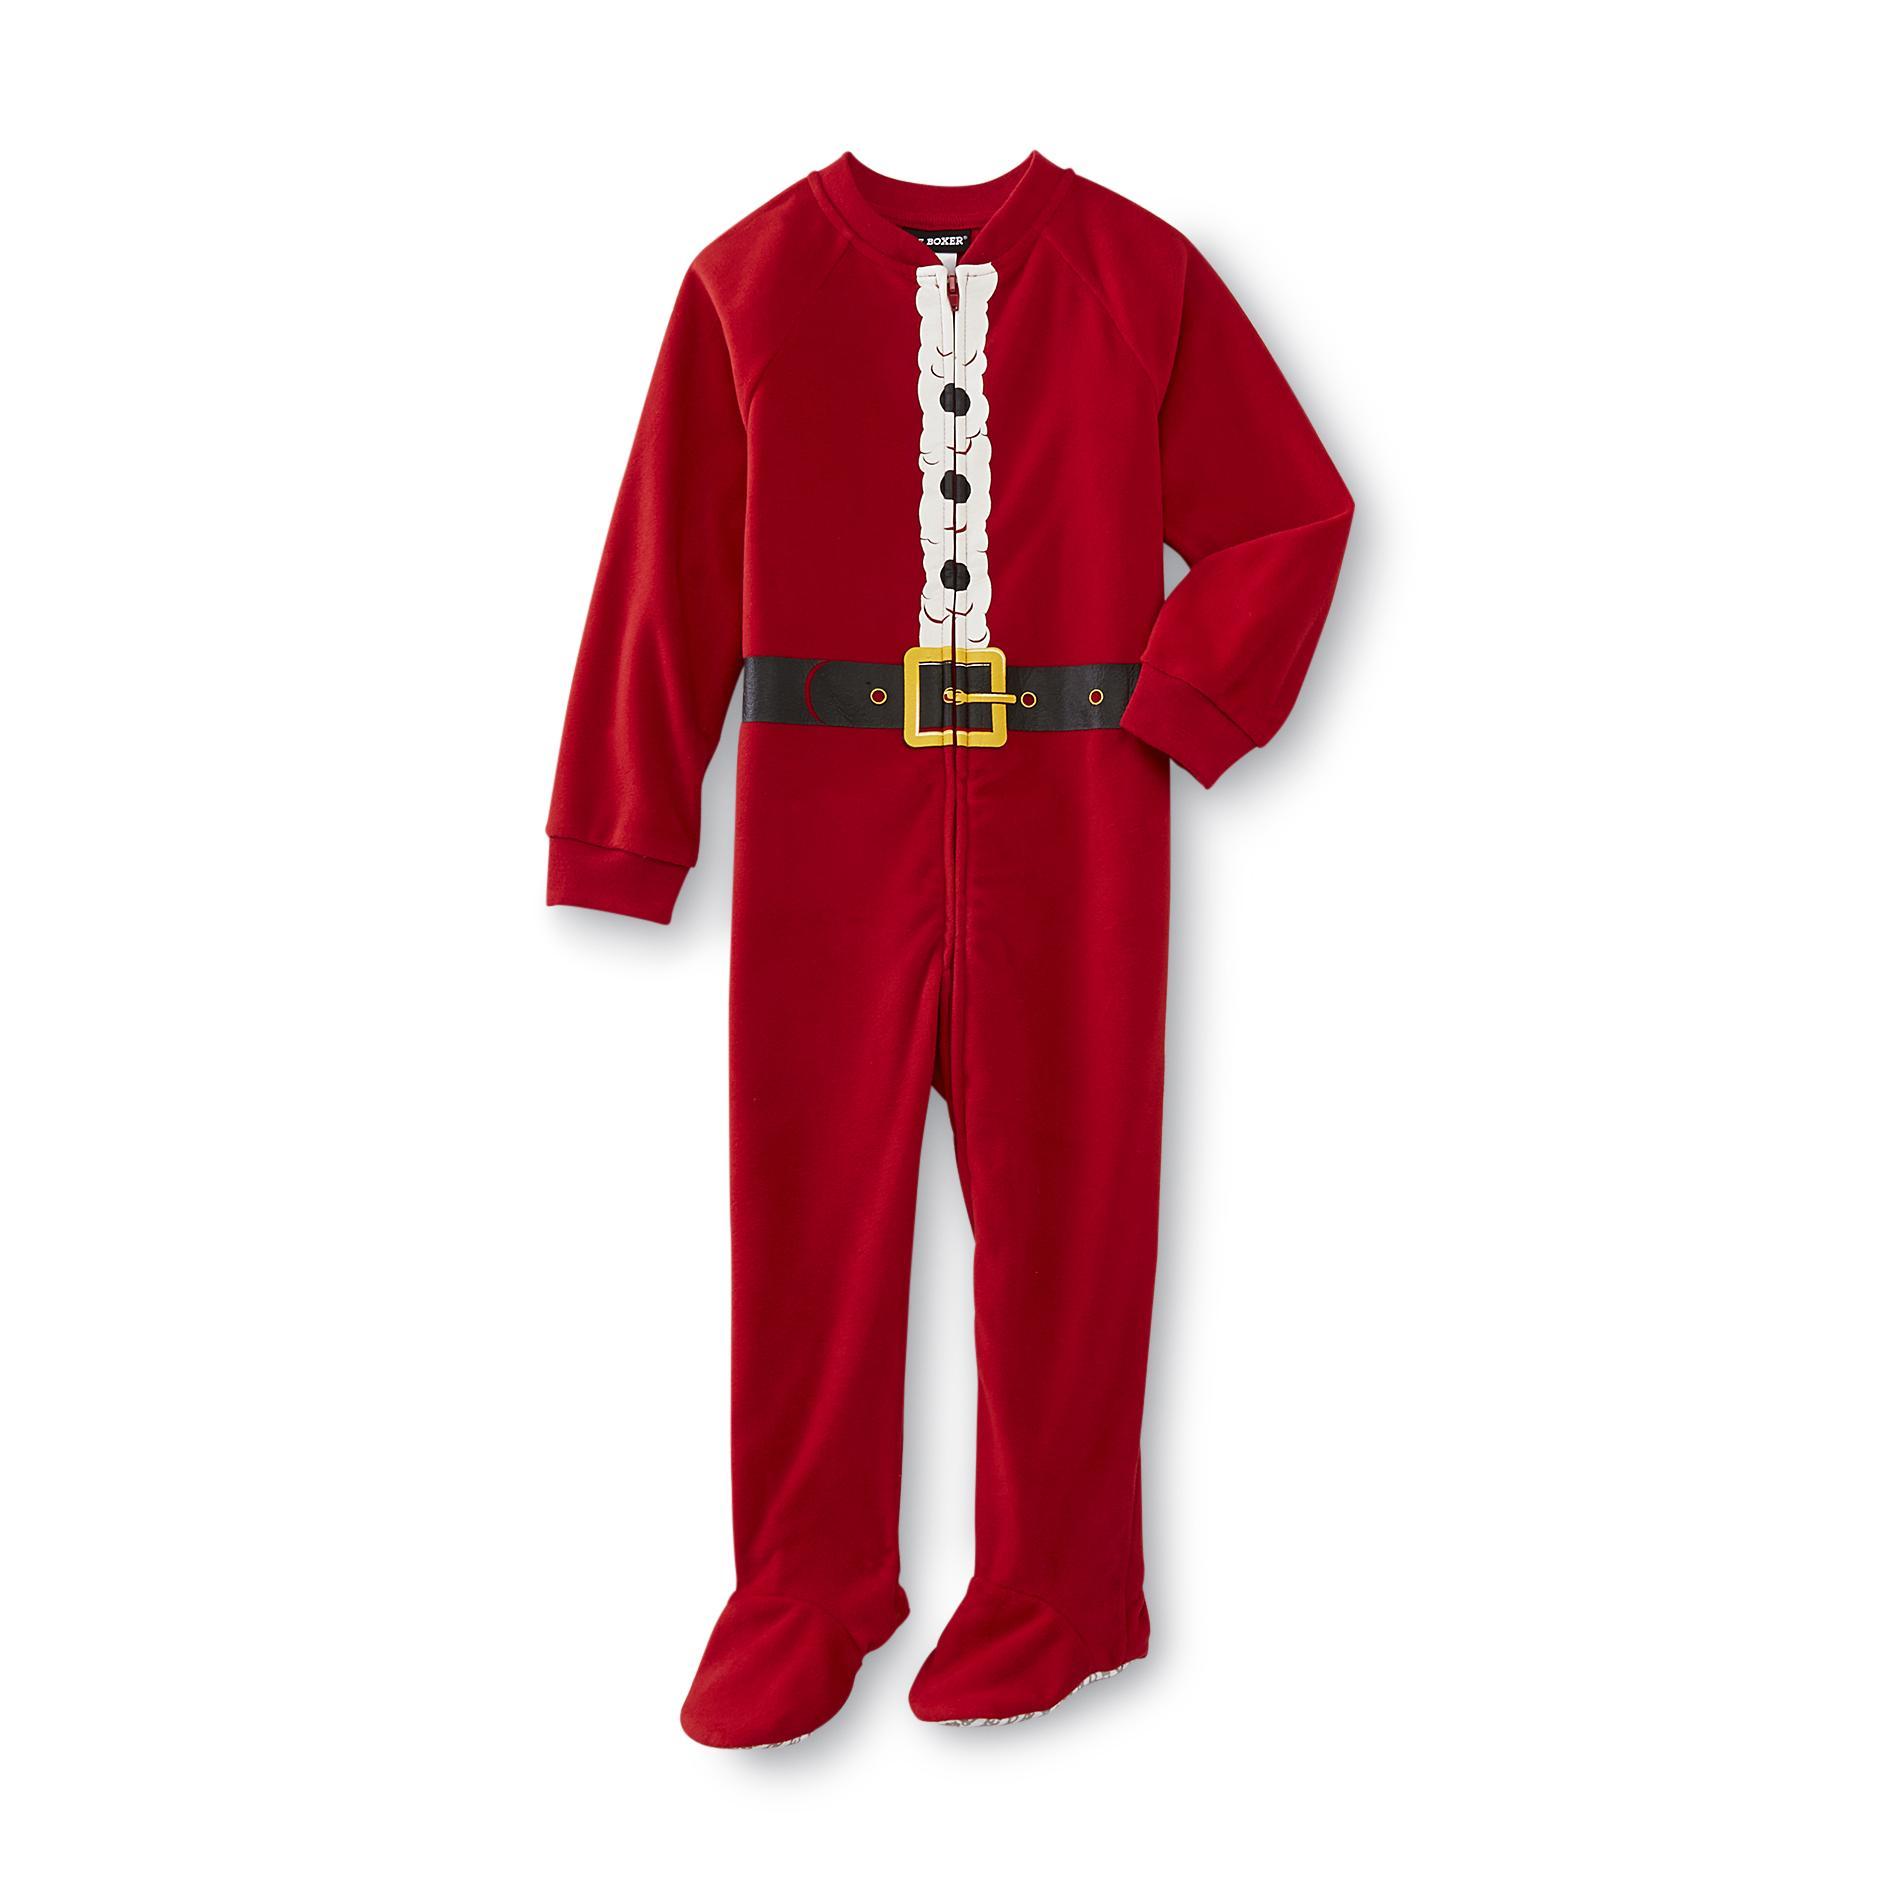 Joe Boxer Infant & Toddler Boy\'s Christmas Fleece Sleeper Pajamas ...